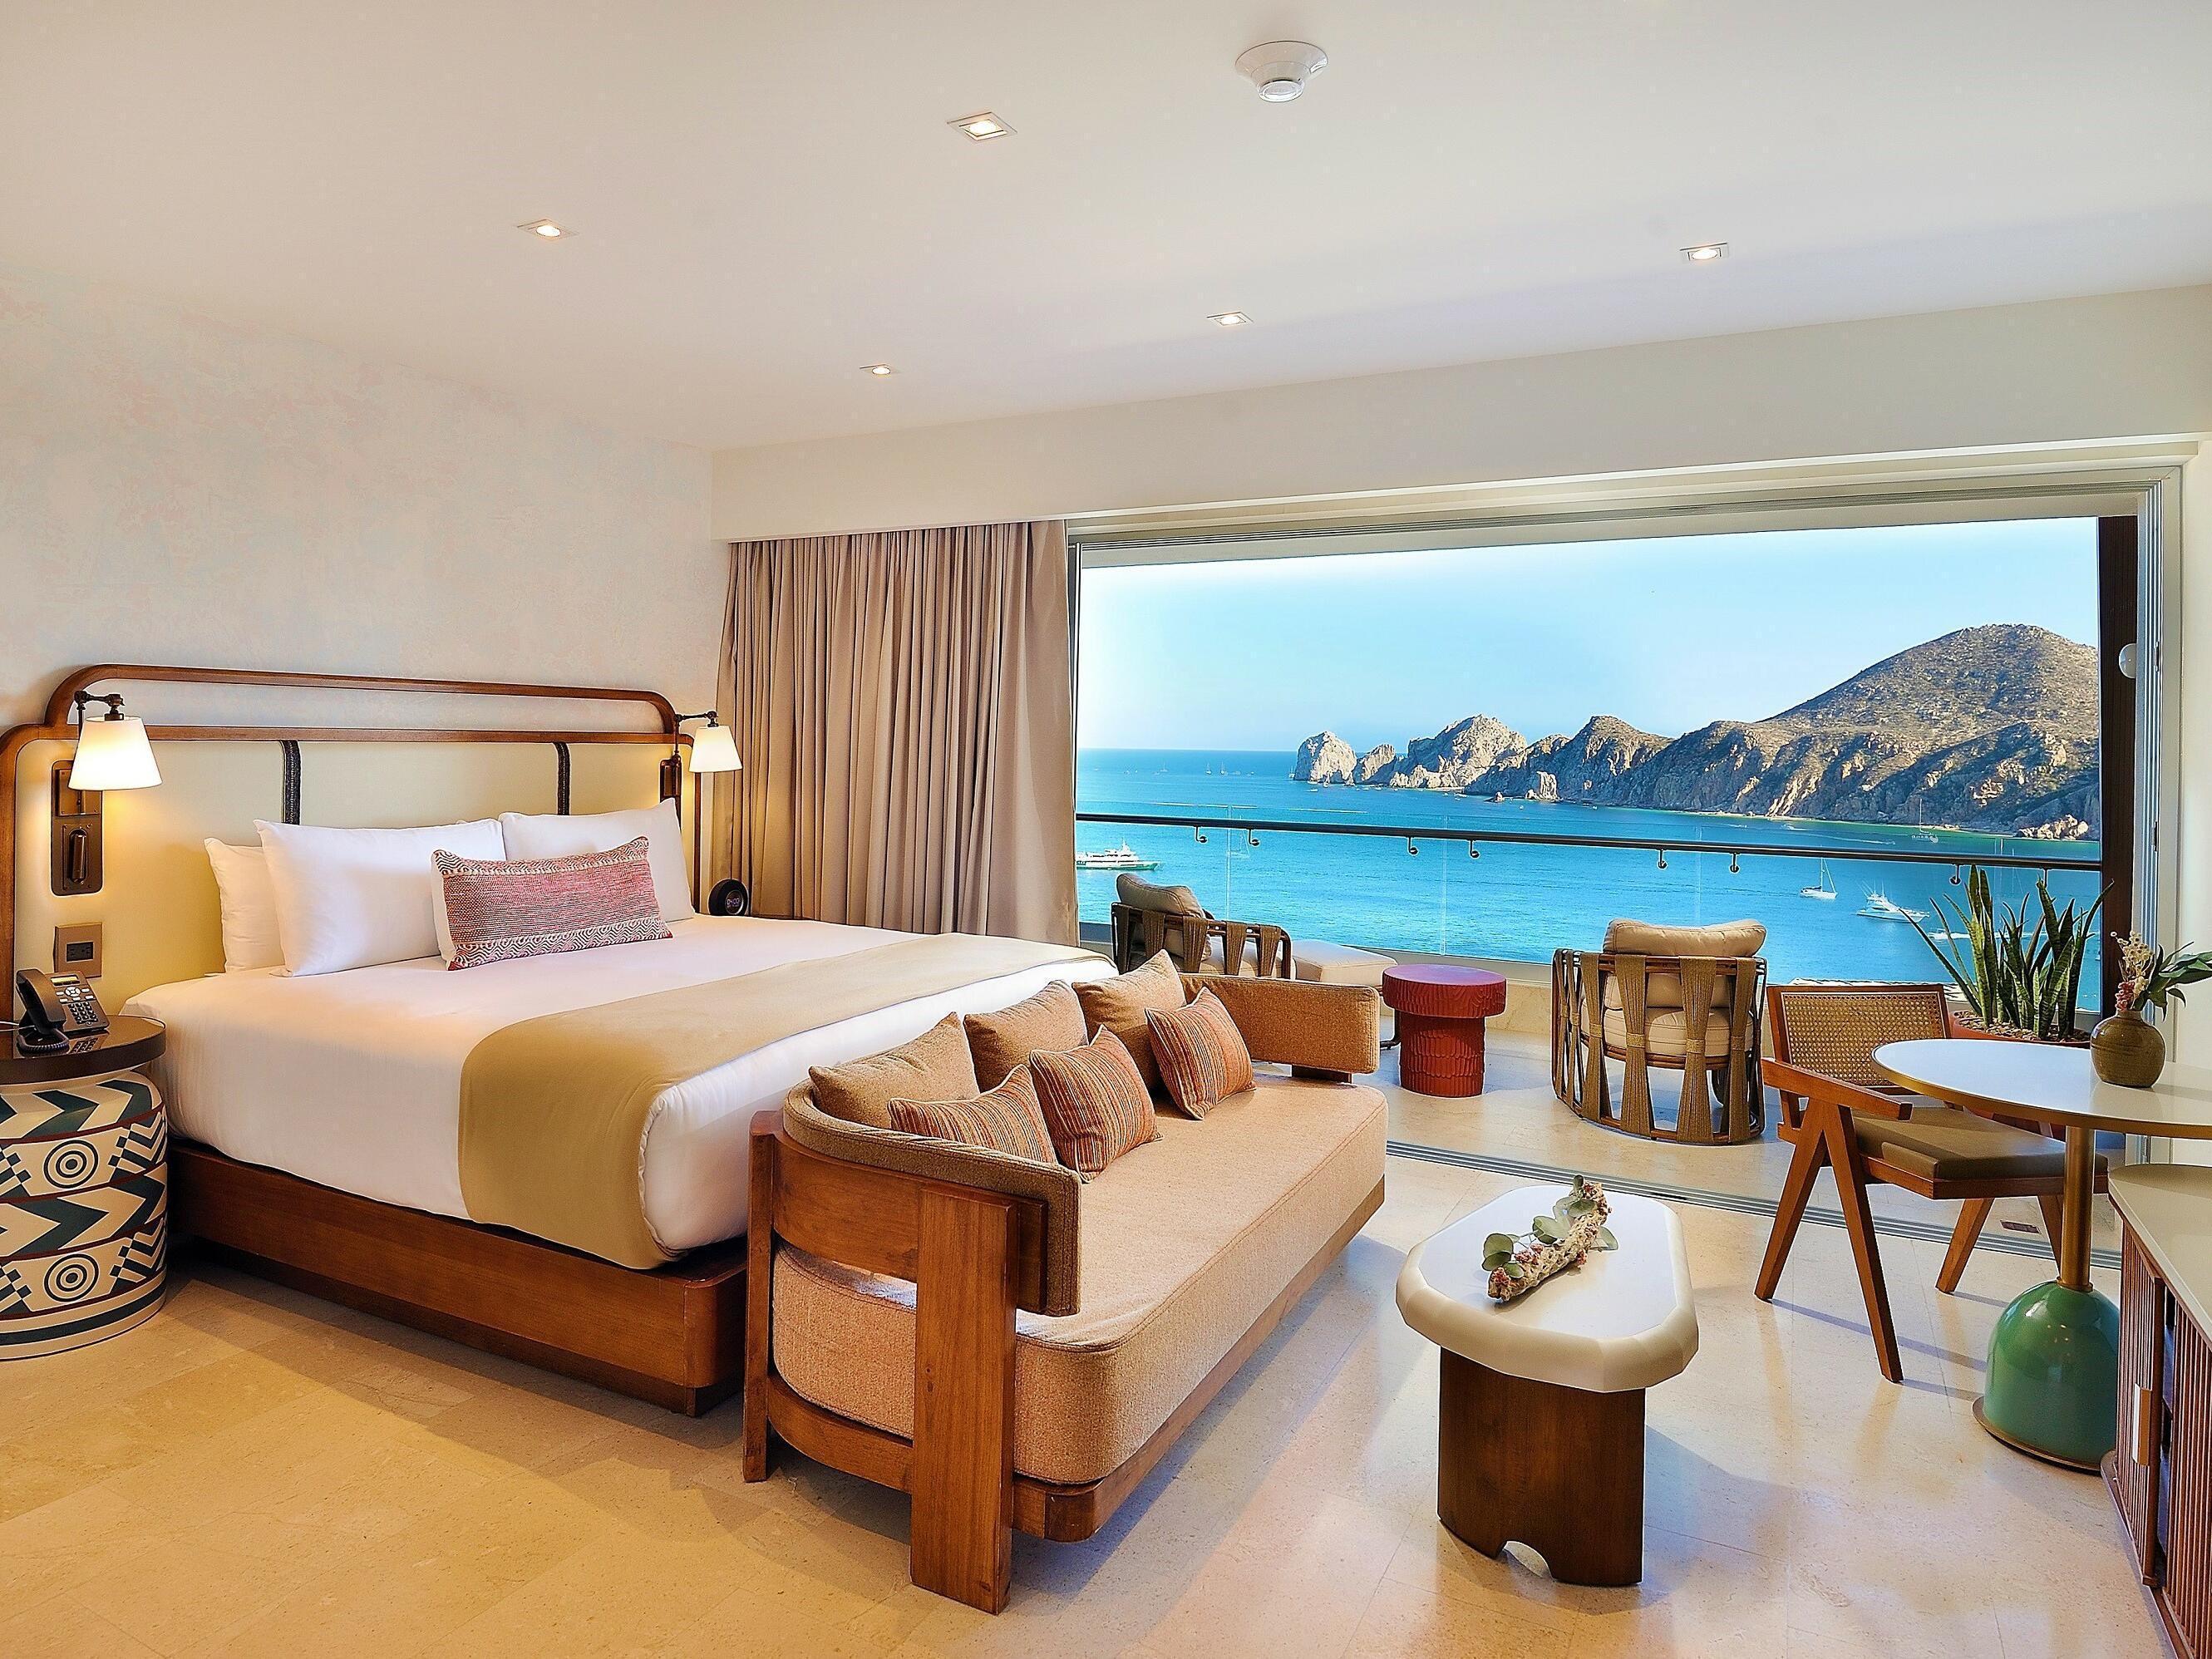 Bedroom in Infinity Suite at Cabo Villas Beach Resort